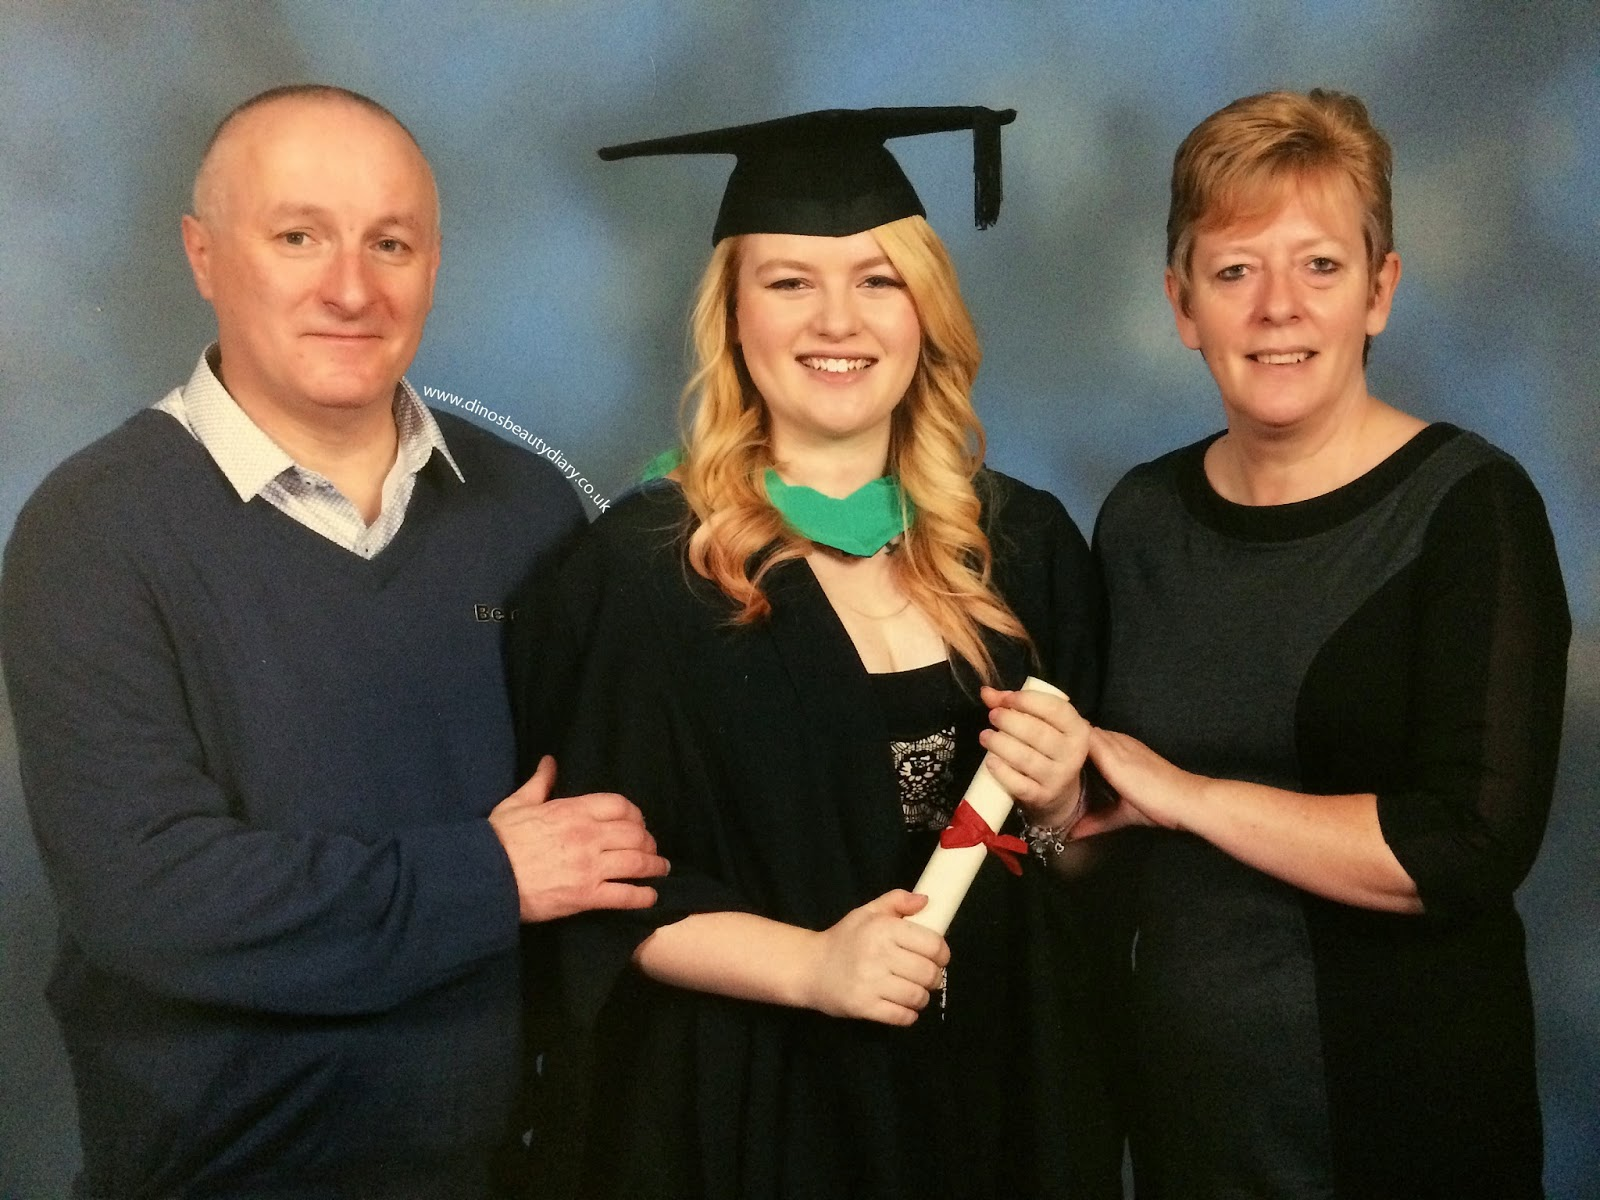 Dinos Beauty Diary - Graduation 29/11/14 - Nottingham Trent University - Nottingham Law School